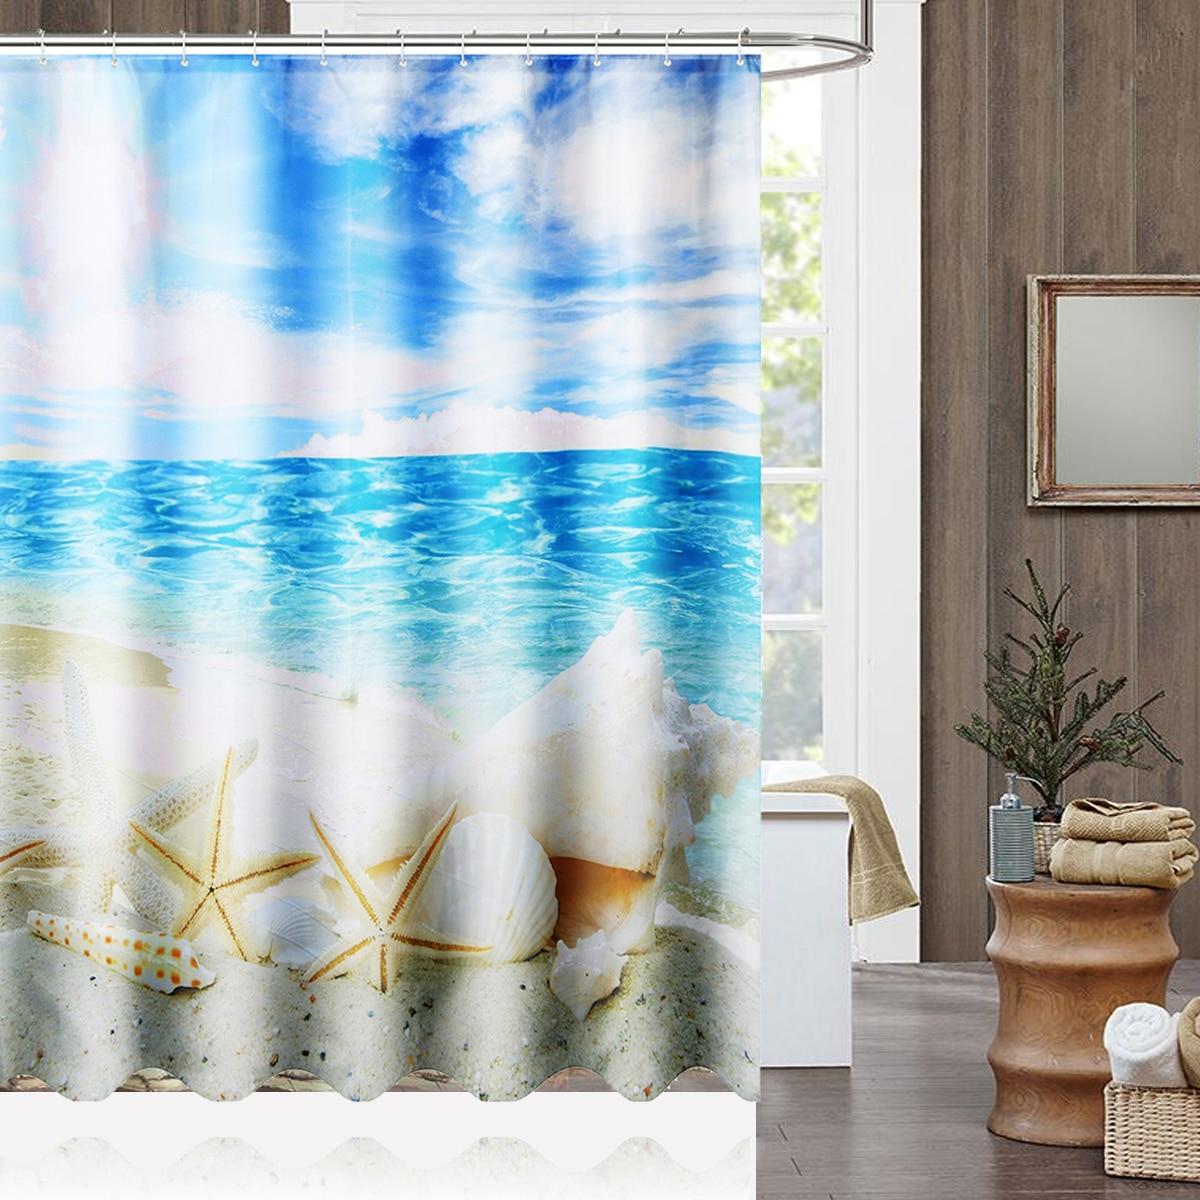 Us 11 7 17 Off 180x180cm Sunshine Beach Shower Curtain Seashell Polyester Waterproof Fabric Ocean Washable Bathroom Home Decor In Shower Curtains